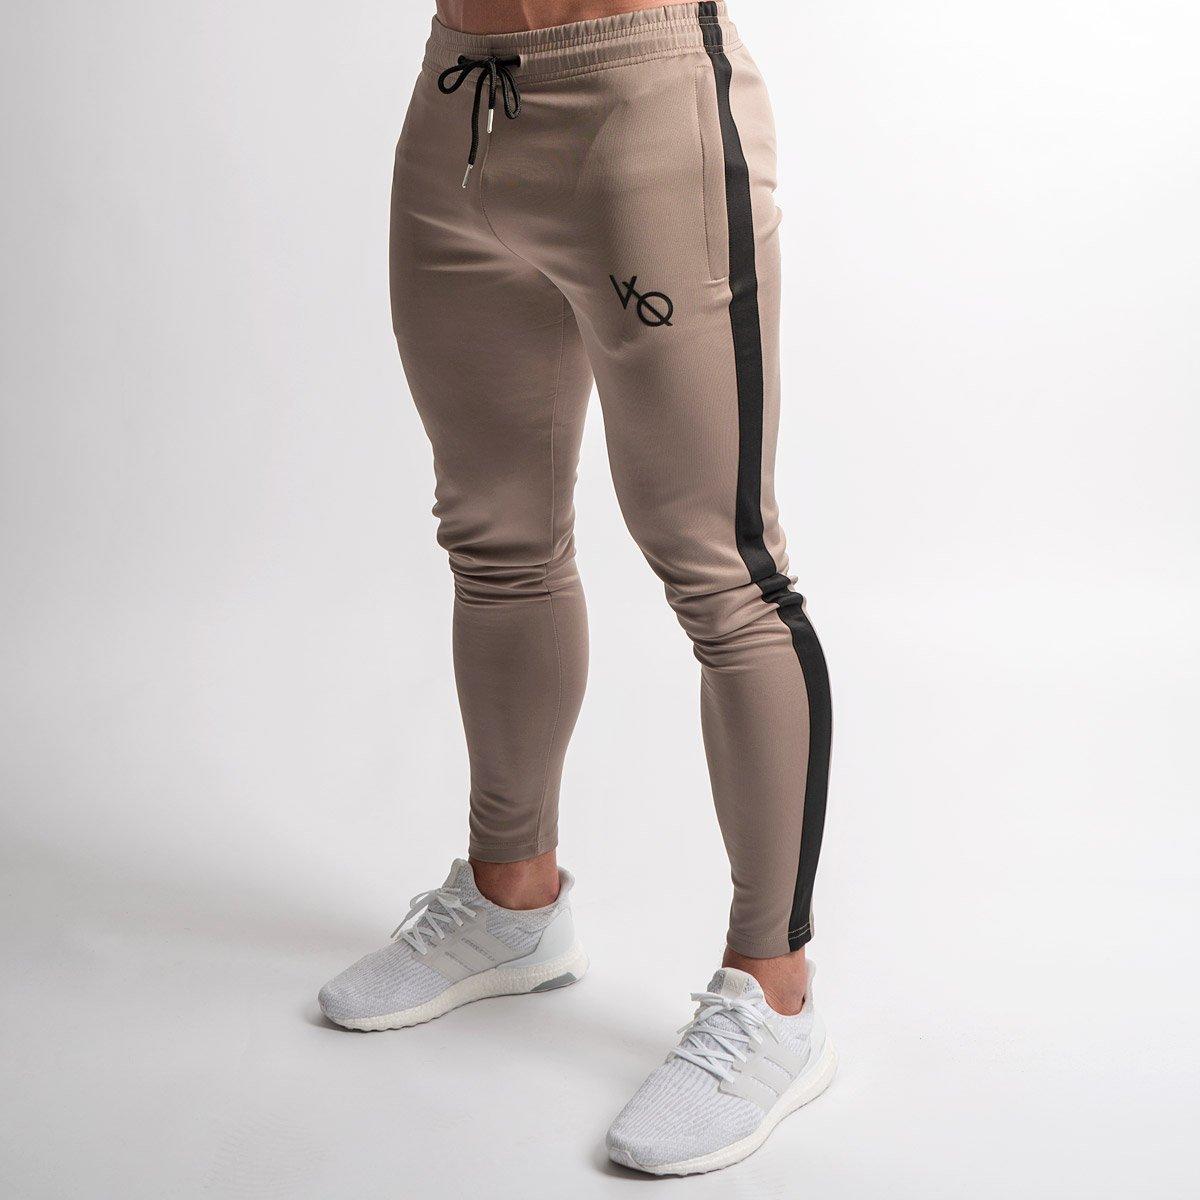 Cotton Sweatpants Fitness Joggers Streetwear Vq Men's Fashion Drawstring-Style Sports